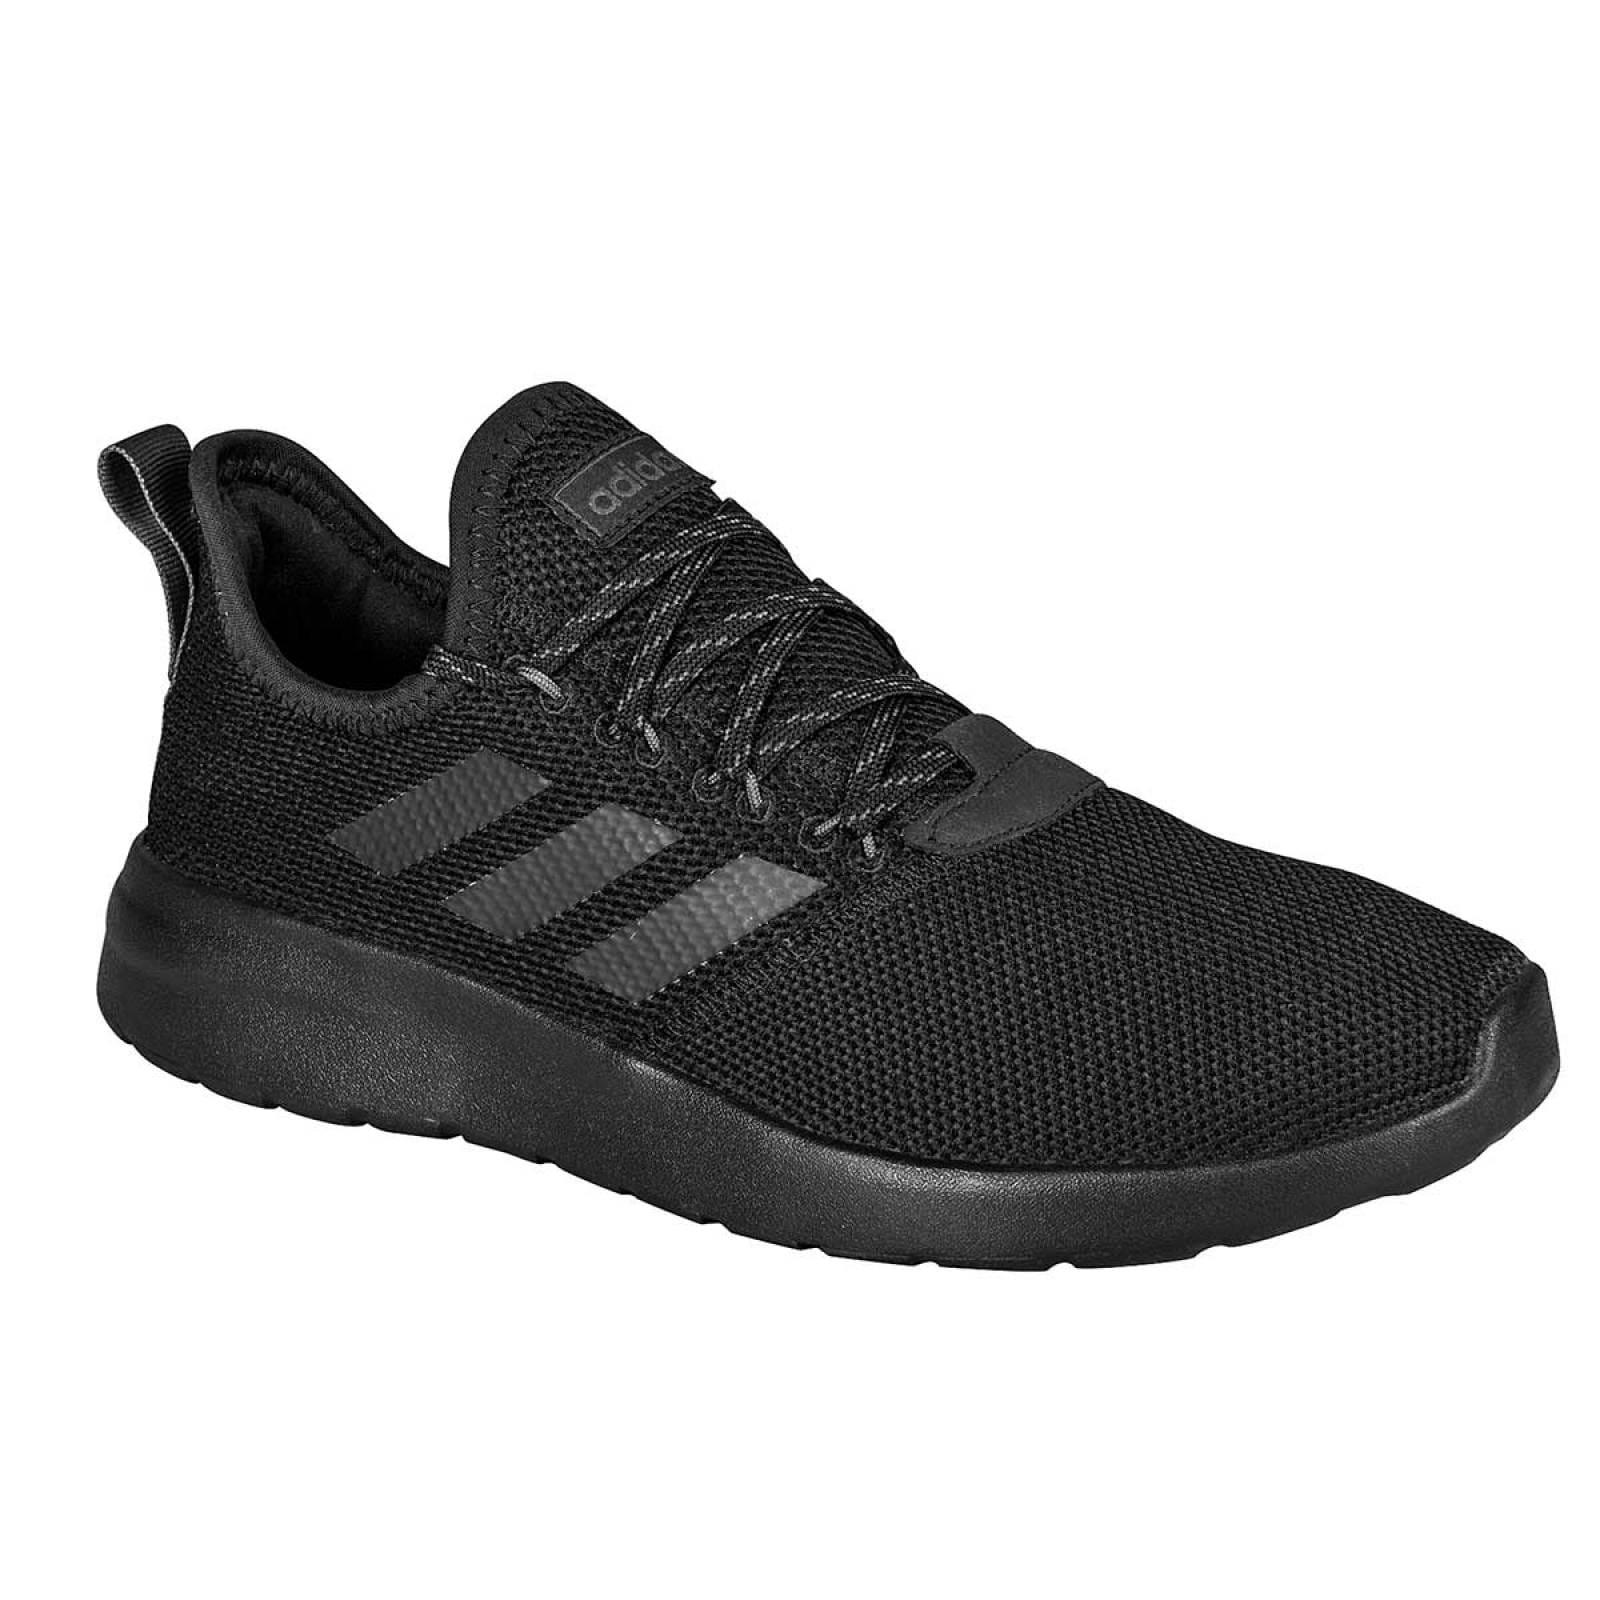 Adidas Tenis Hombre Negro lite racer reborn